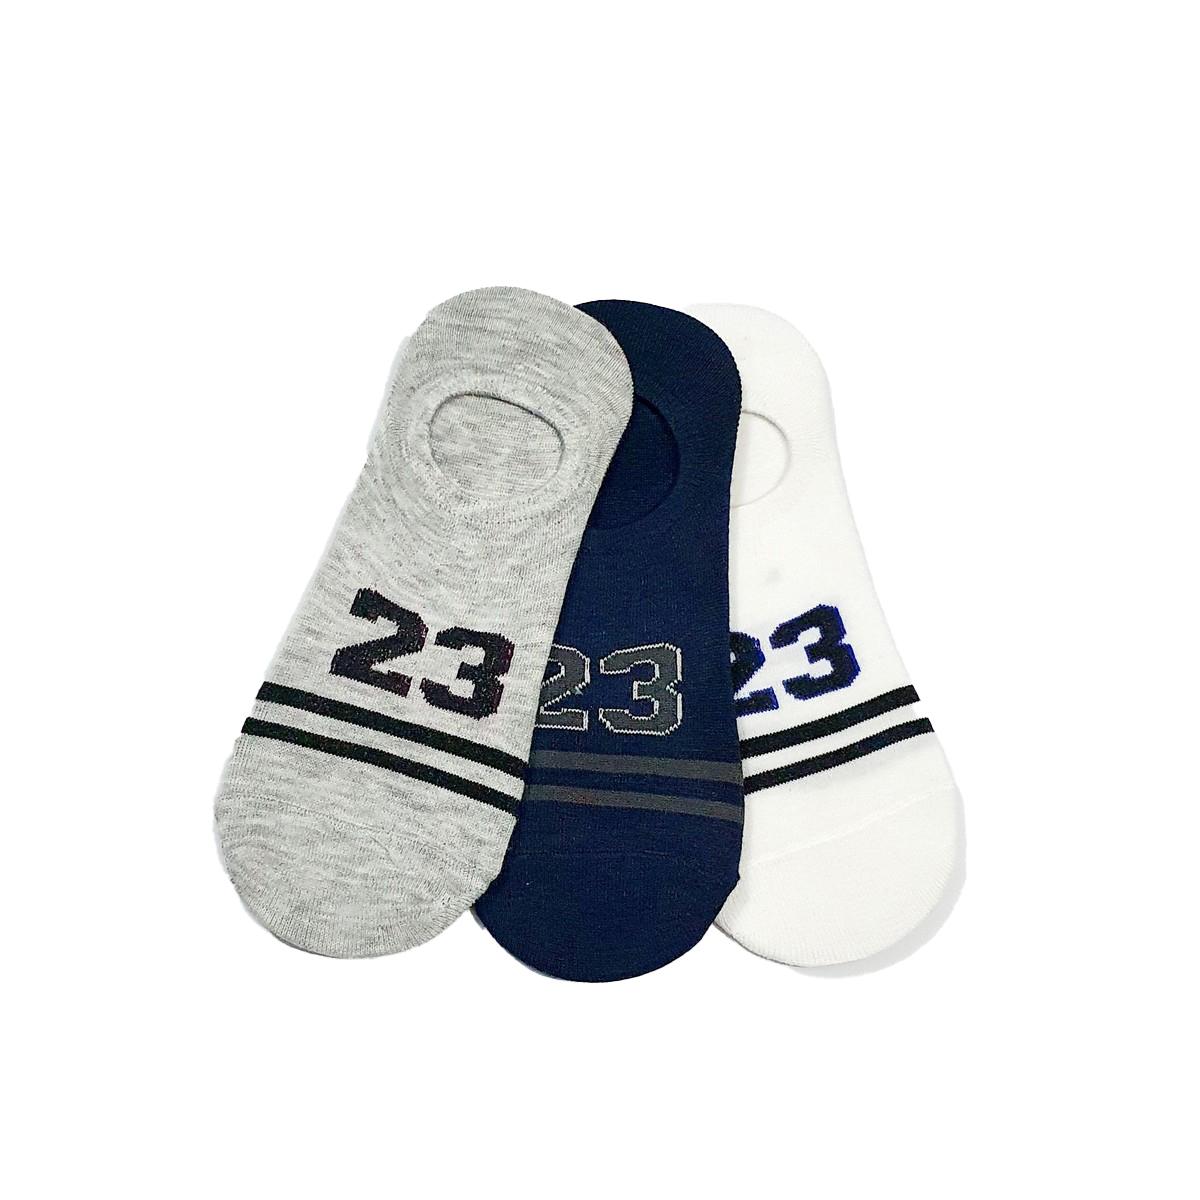 Pack of 3 pairs| Loafer socks for men women | Invisible no show socks| multi-colors multi-design| Low cut socks